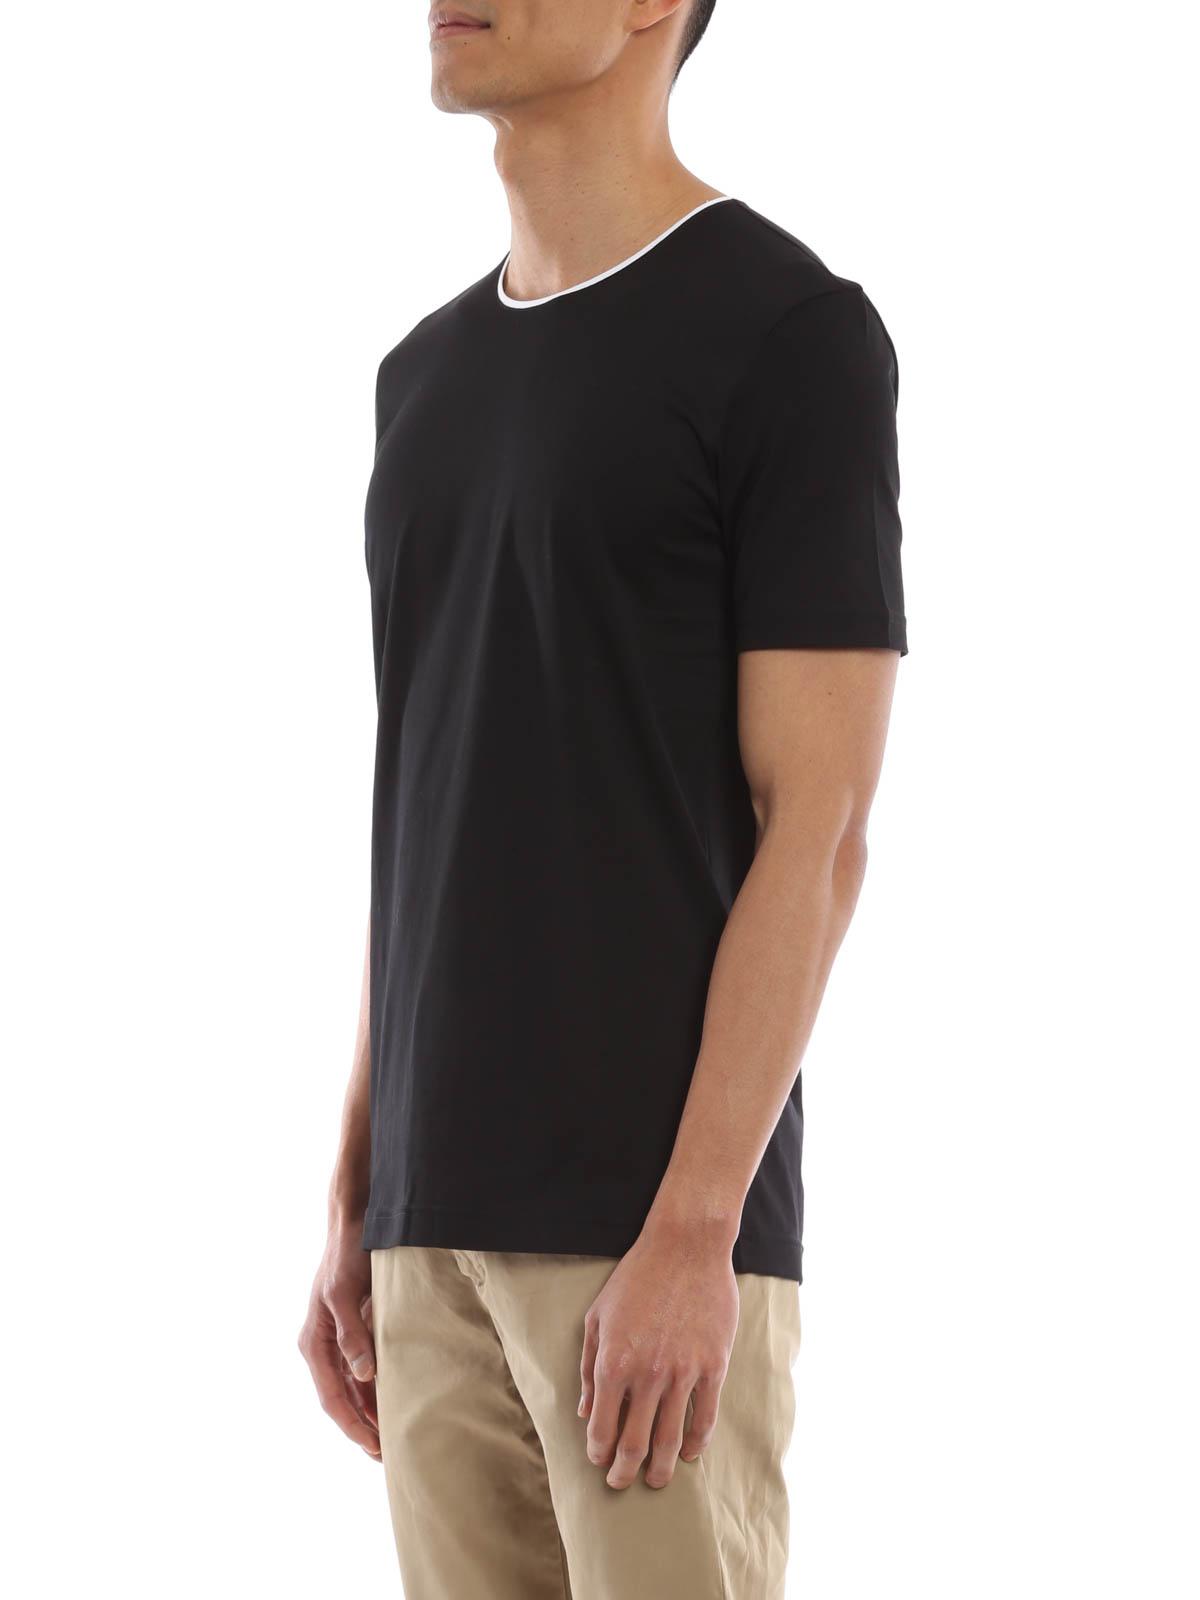 dolce gabbana cotton t shirt t shirts g8fx6t g7fto n0000. Black Bedroom Furniture Sets. Home Design Ideas